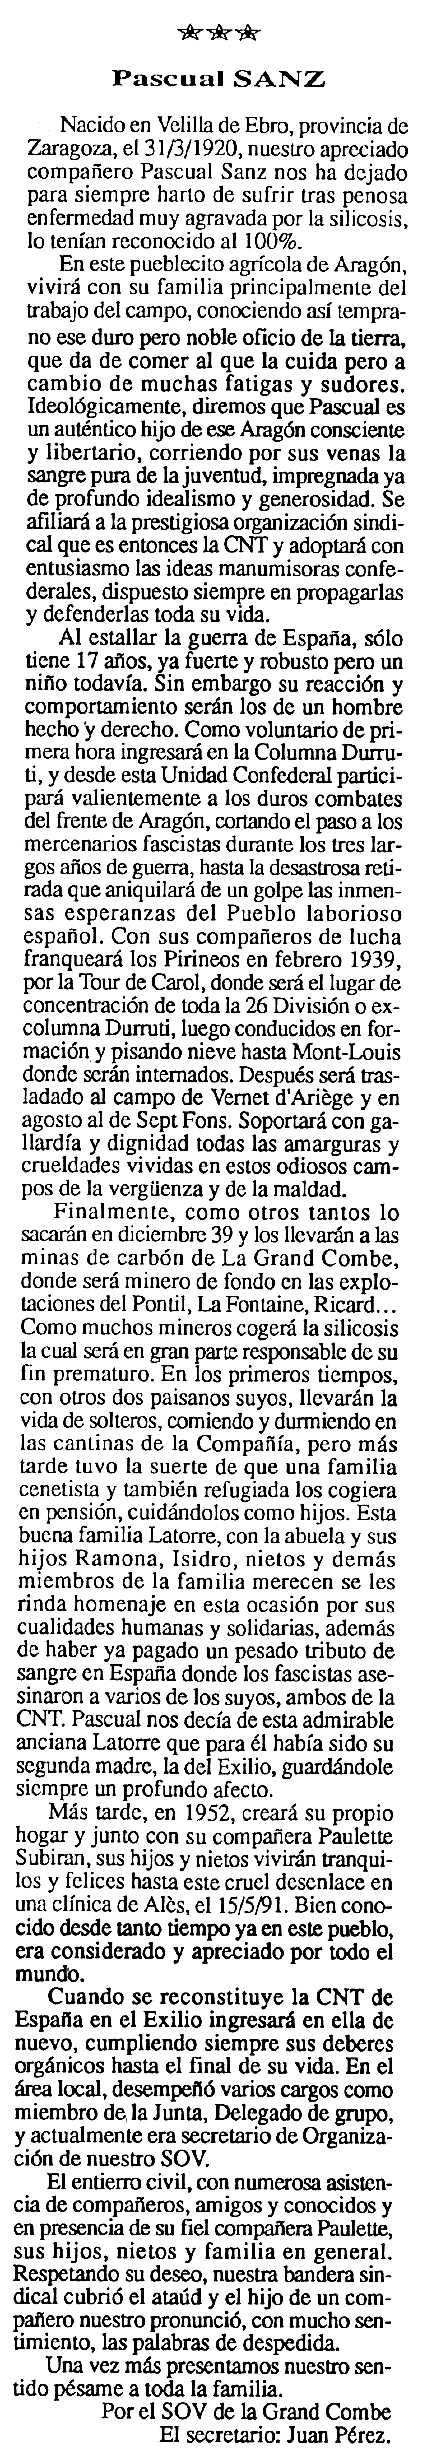 "Necrològica de Pascual Sanz apareguda en el periòdic tolosà ""Cenit"" del 3 de setembre de 1991"